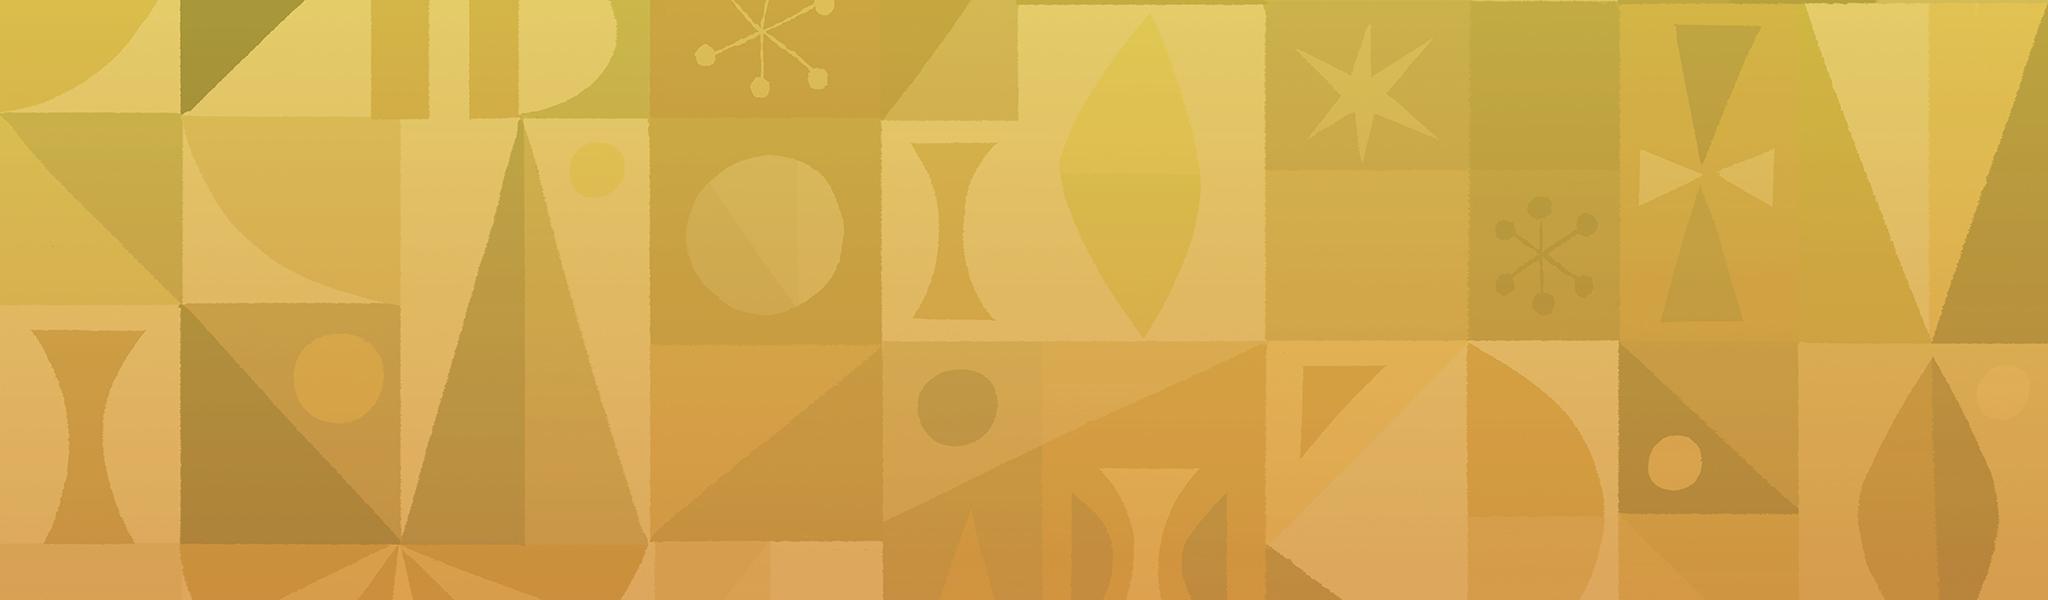 Pattern-Yellow_2048x600-Survey